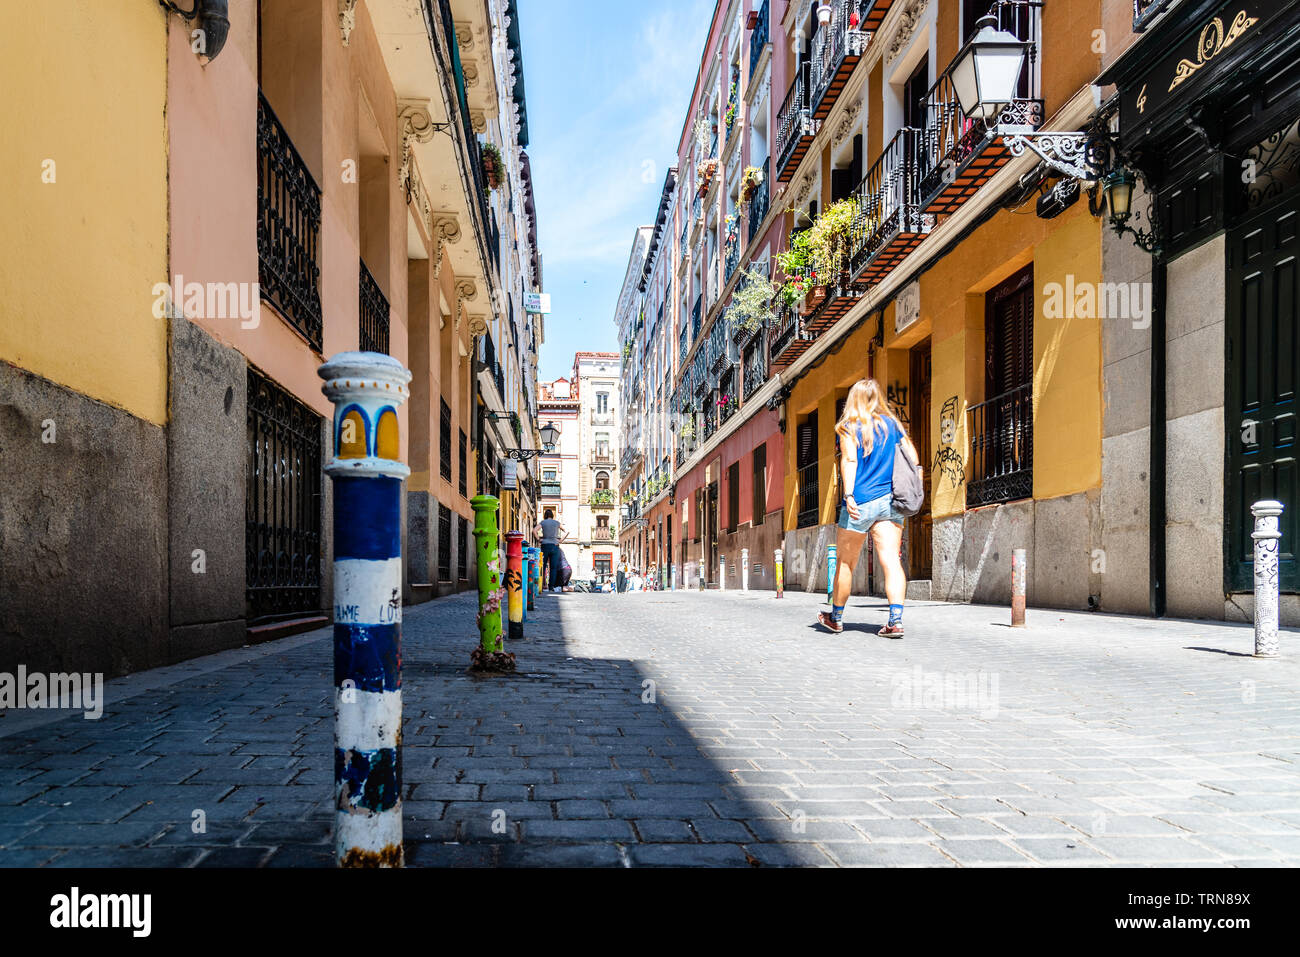 Madrid, Spain - June 9, 2019: Street scene during Graffiti festival in Malasana district in Madrid. Malasana is one of the trendiest neighborhoods in Stock Photo